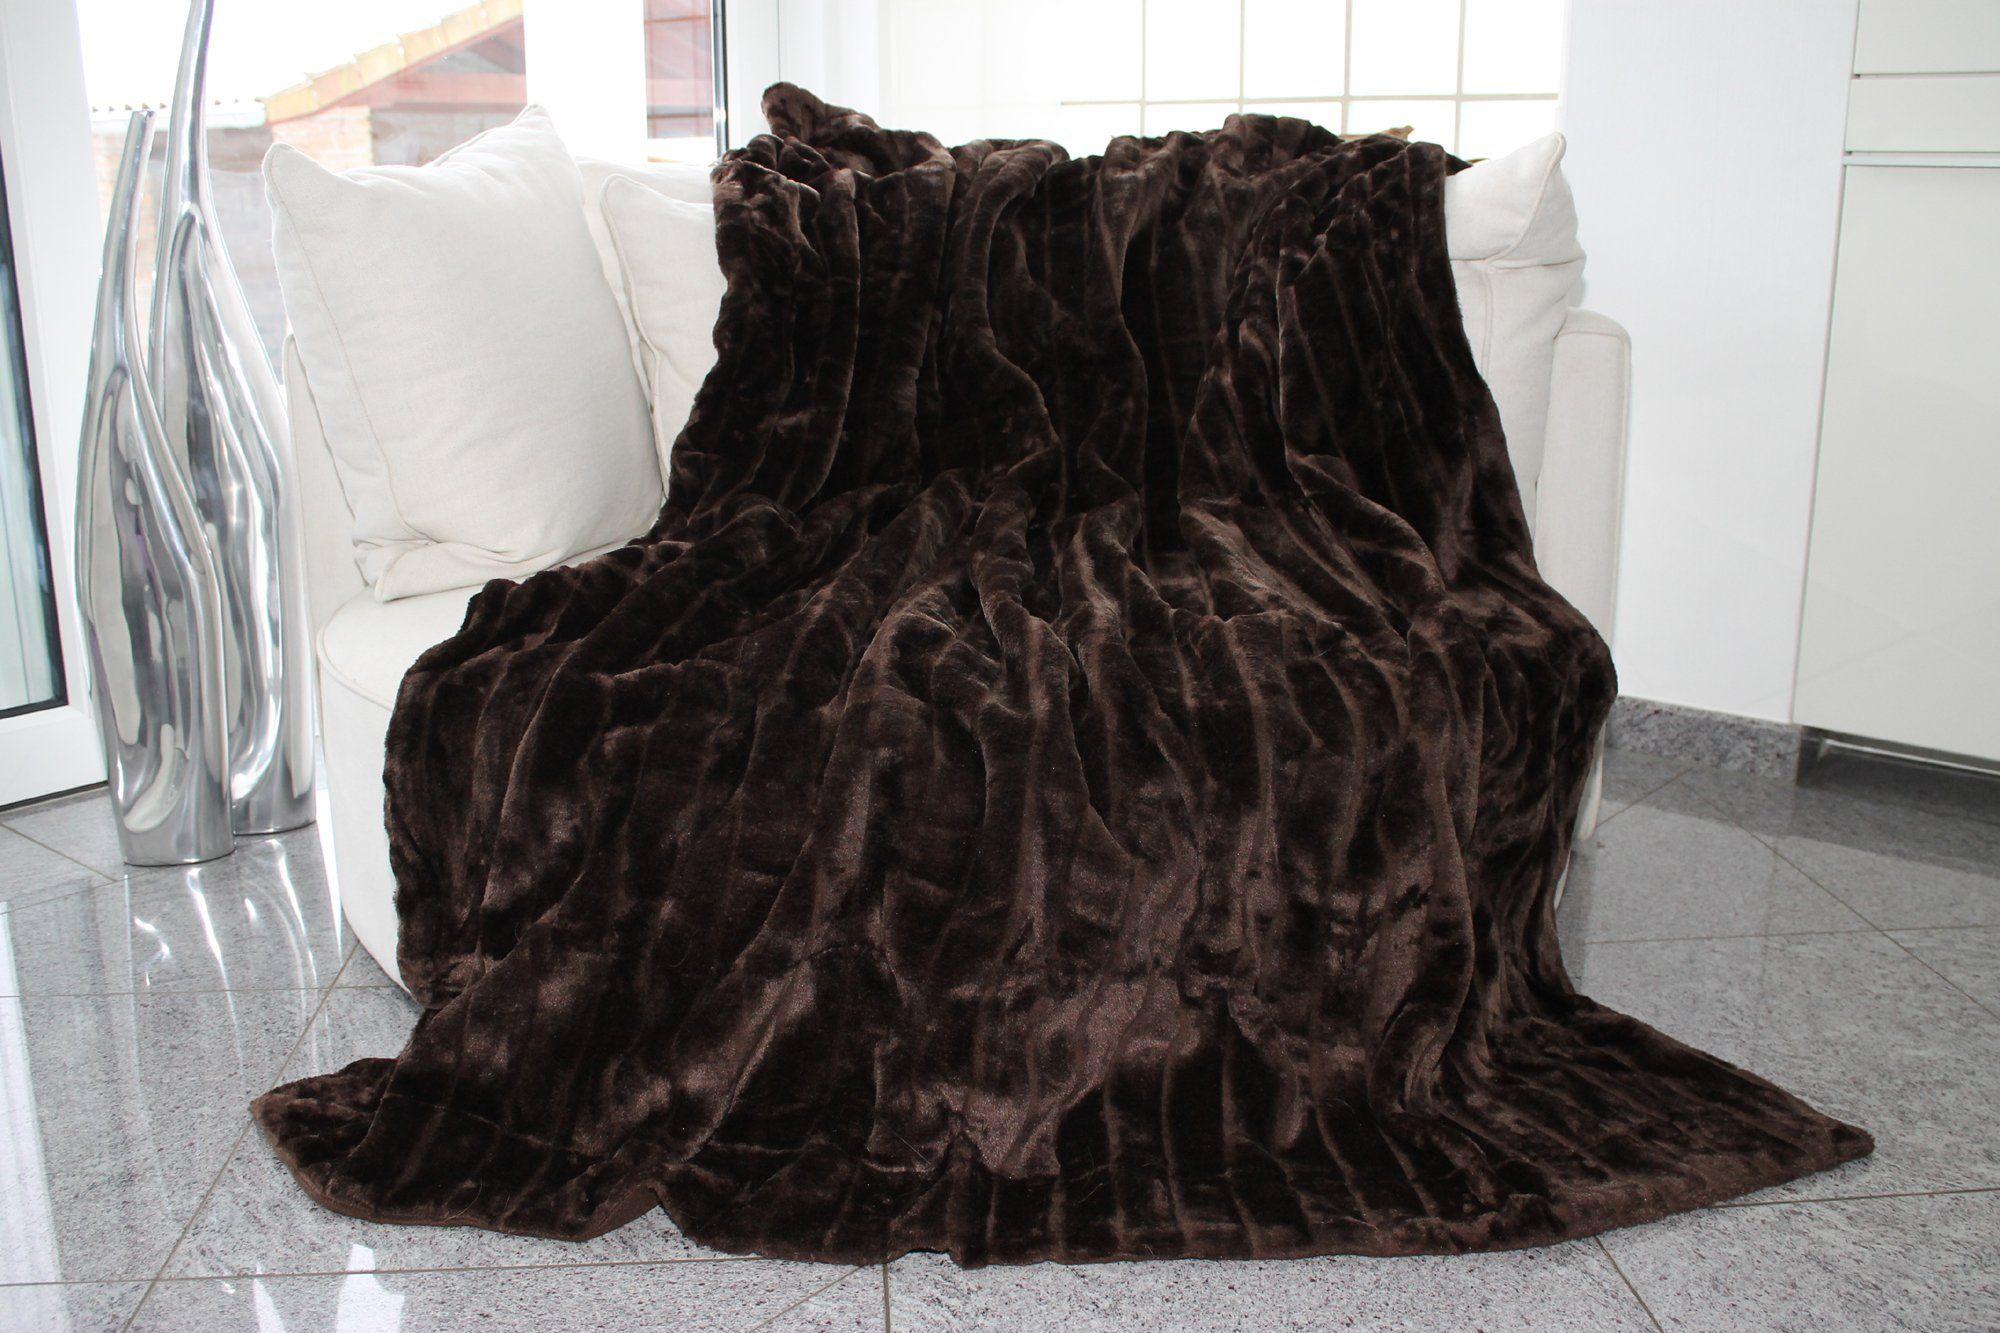 Felldecke Braun Hochwertige Kuscheldecke Decke Wohndecke